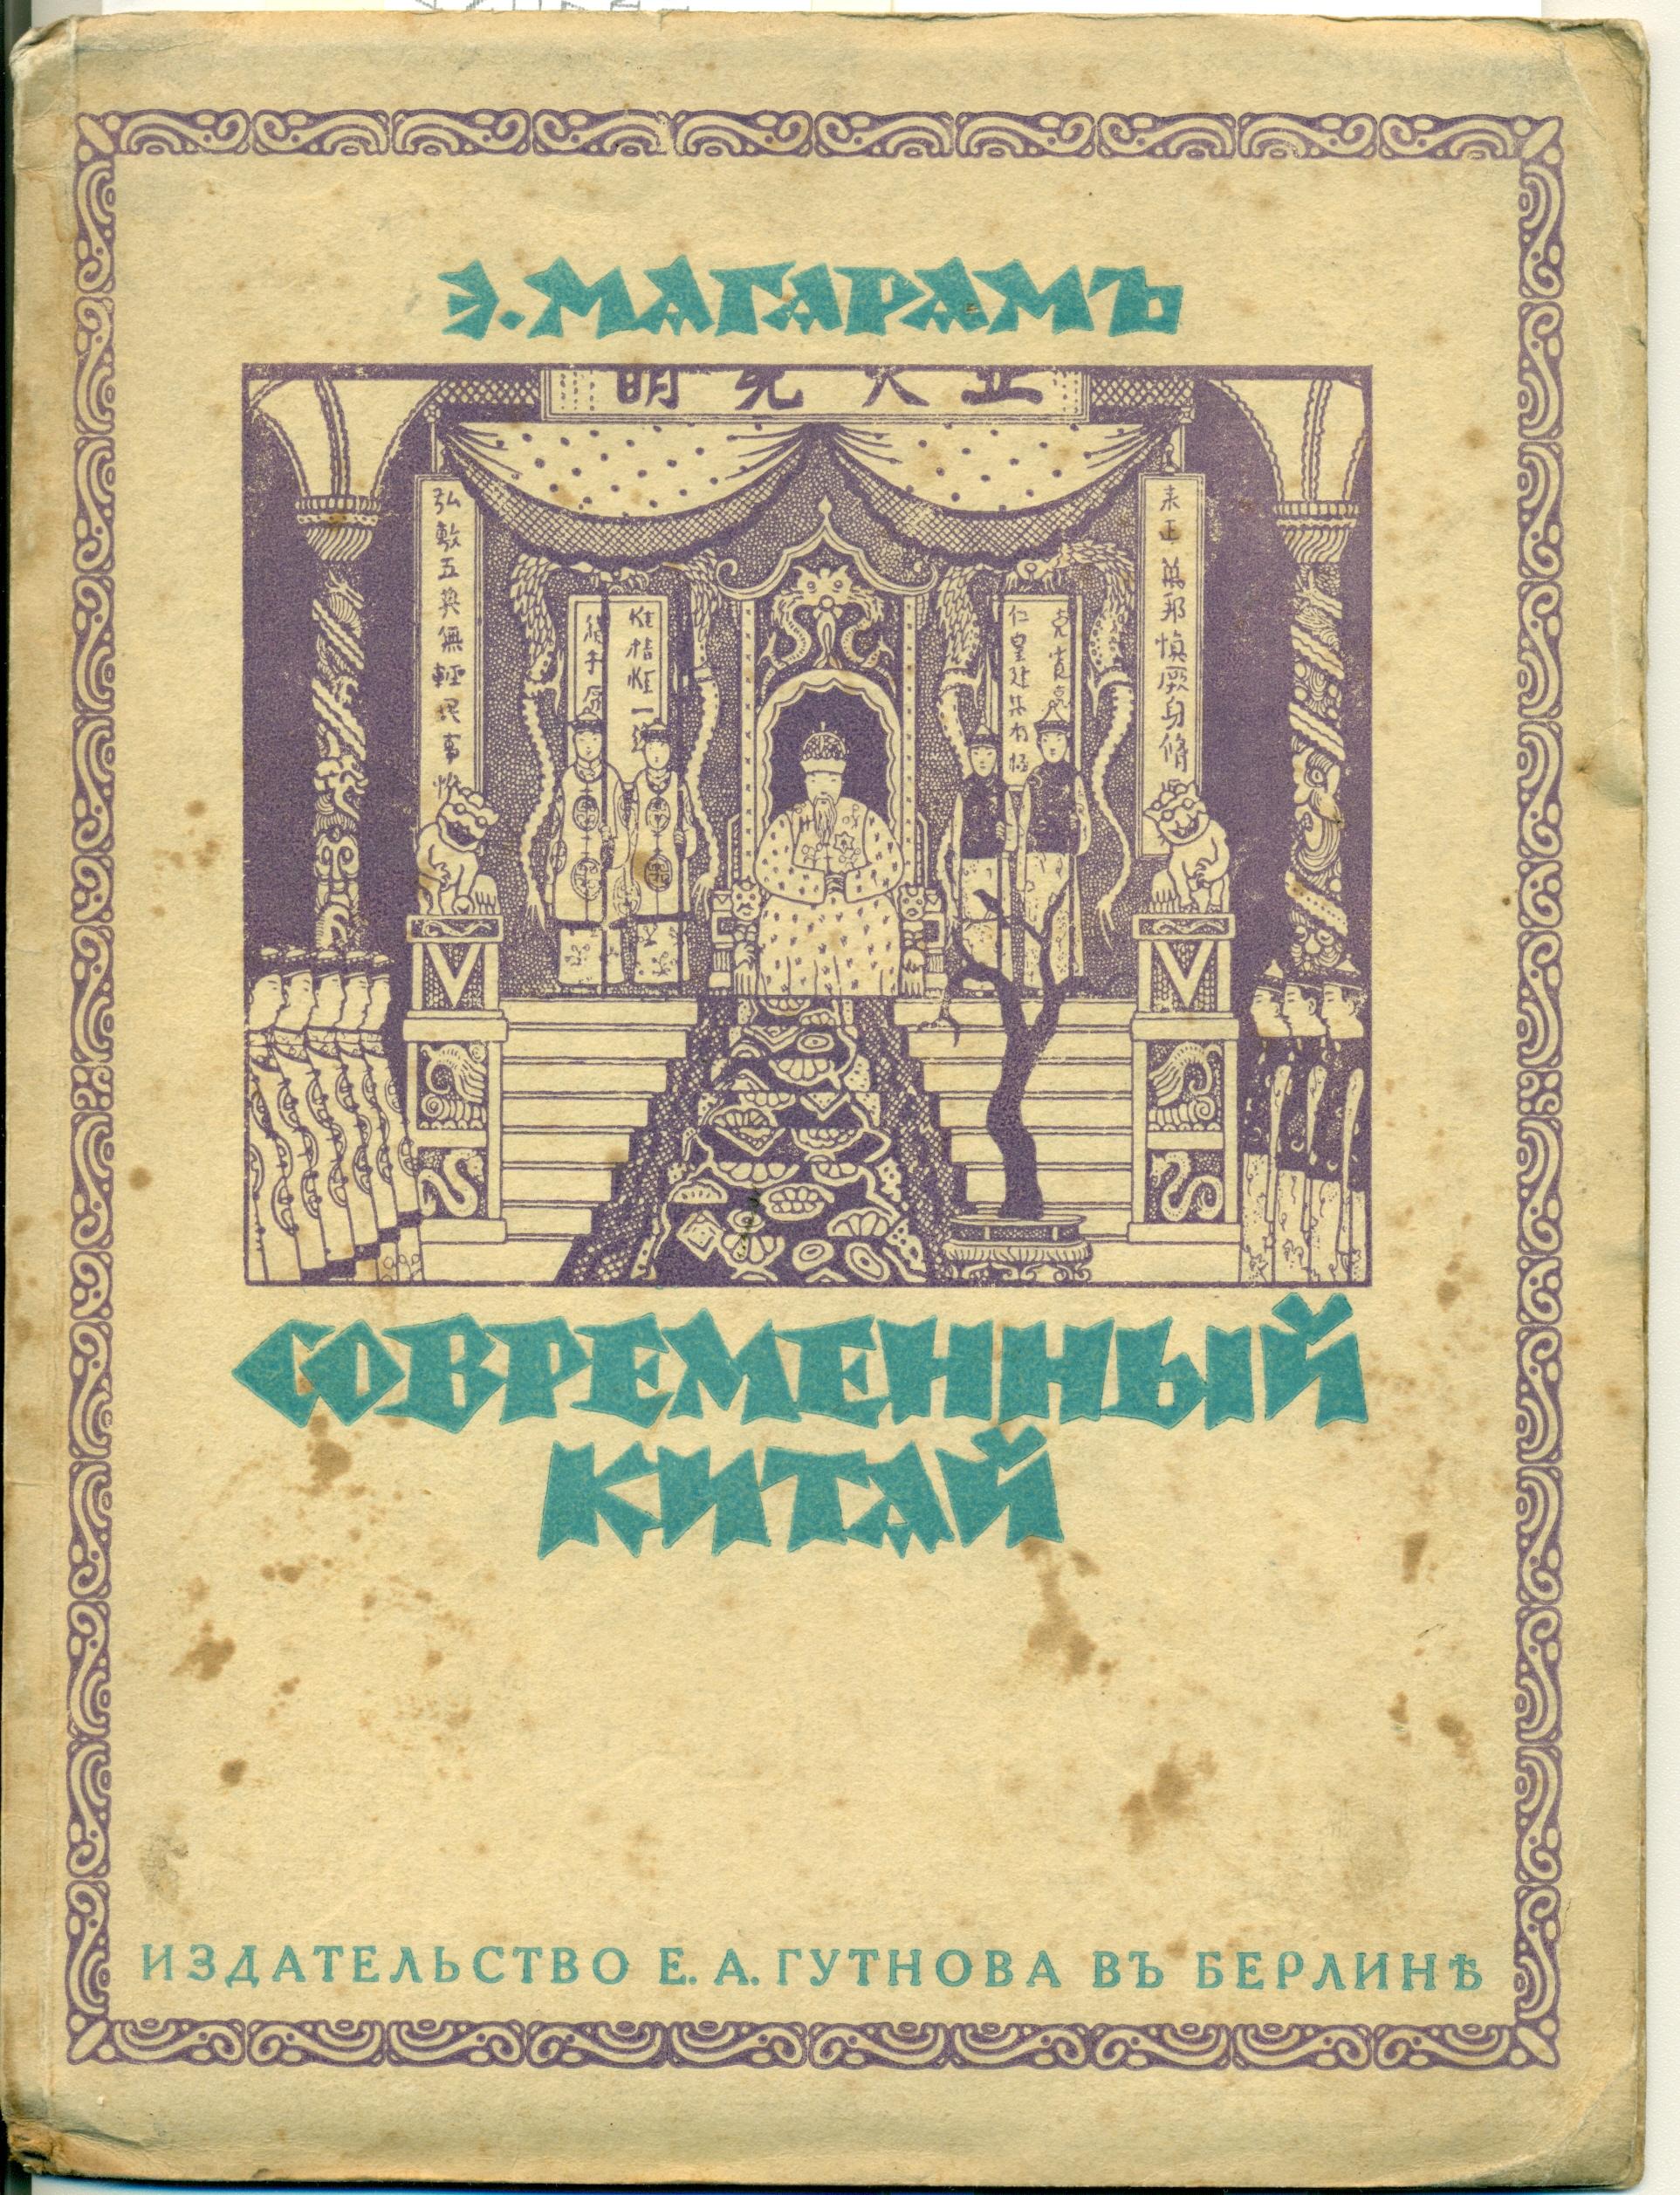 Cover of Sovremennyi Kitai